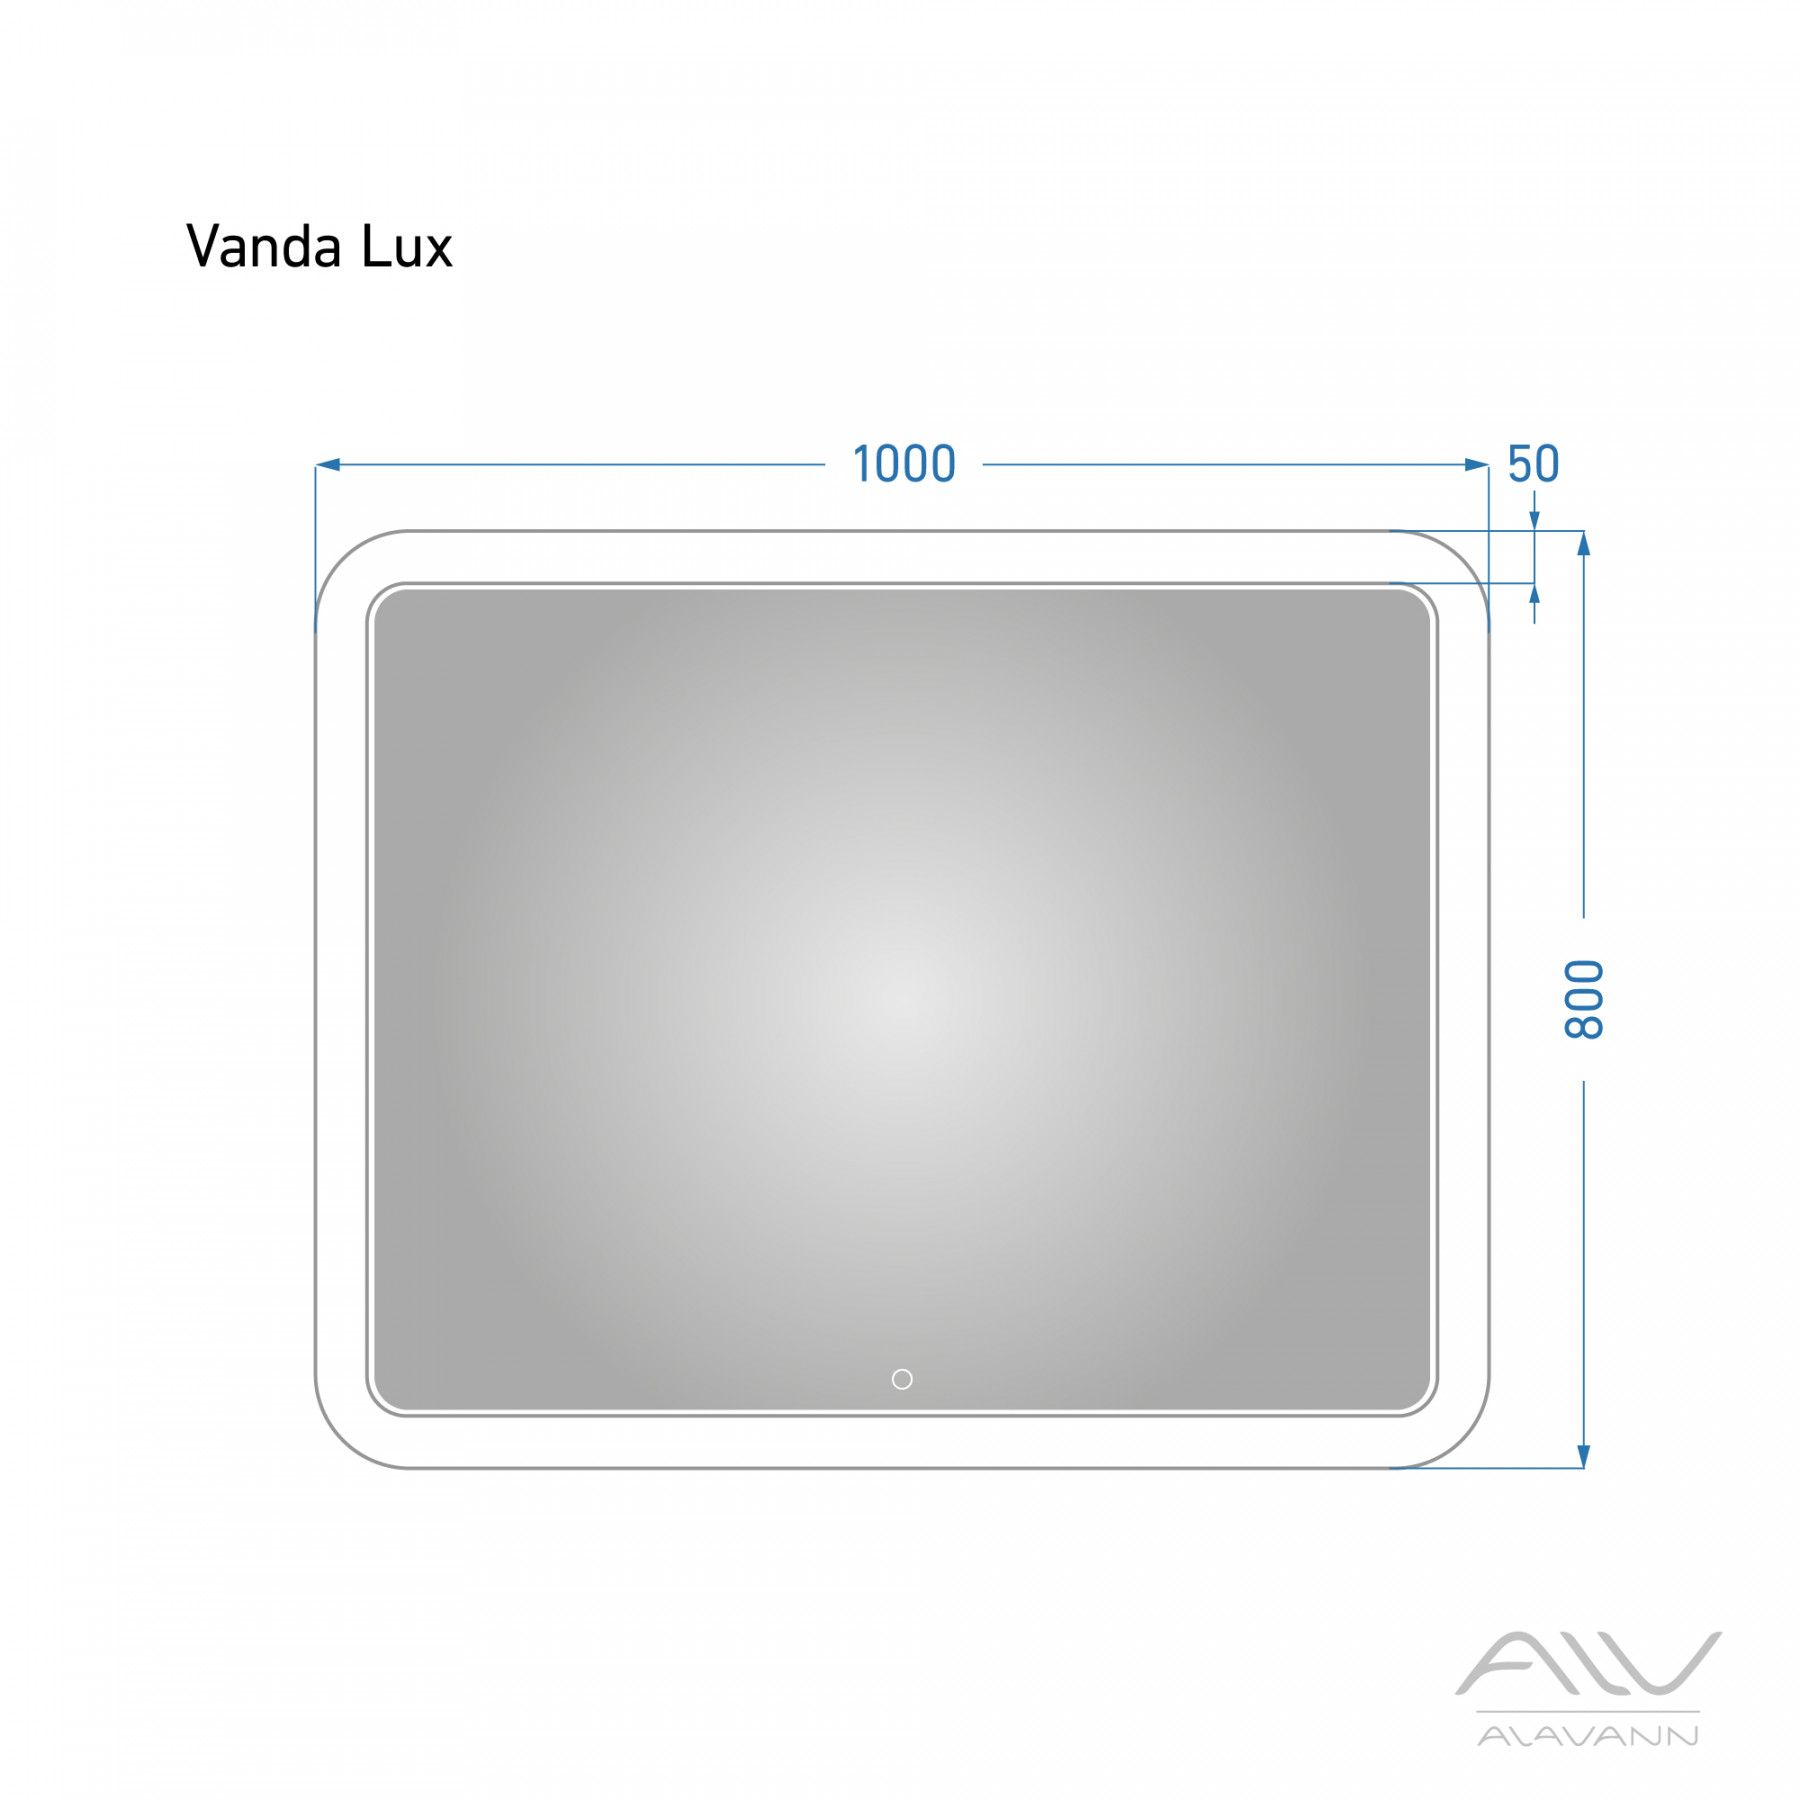 Зеркало с подсветкой Alavann Vanda Lux 100X80h